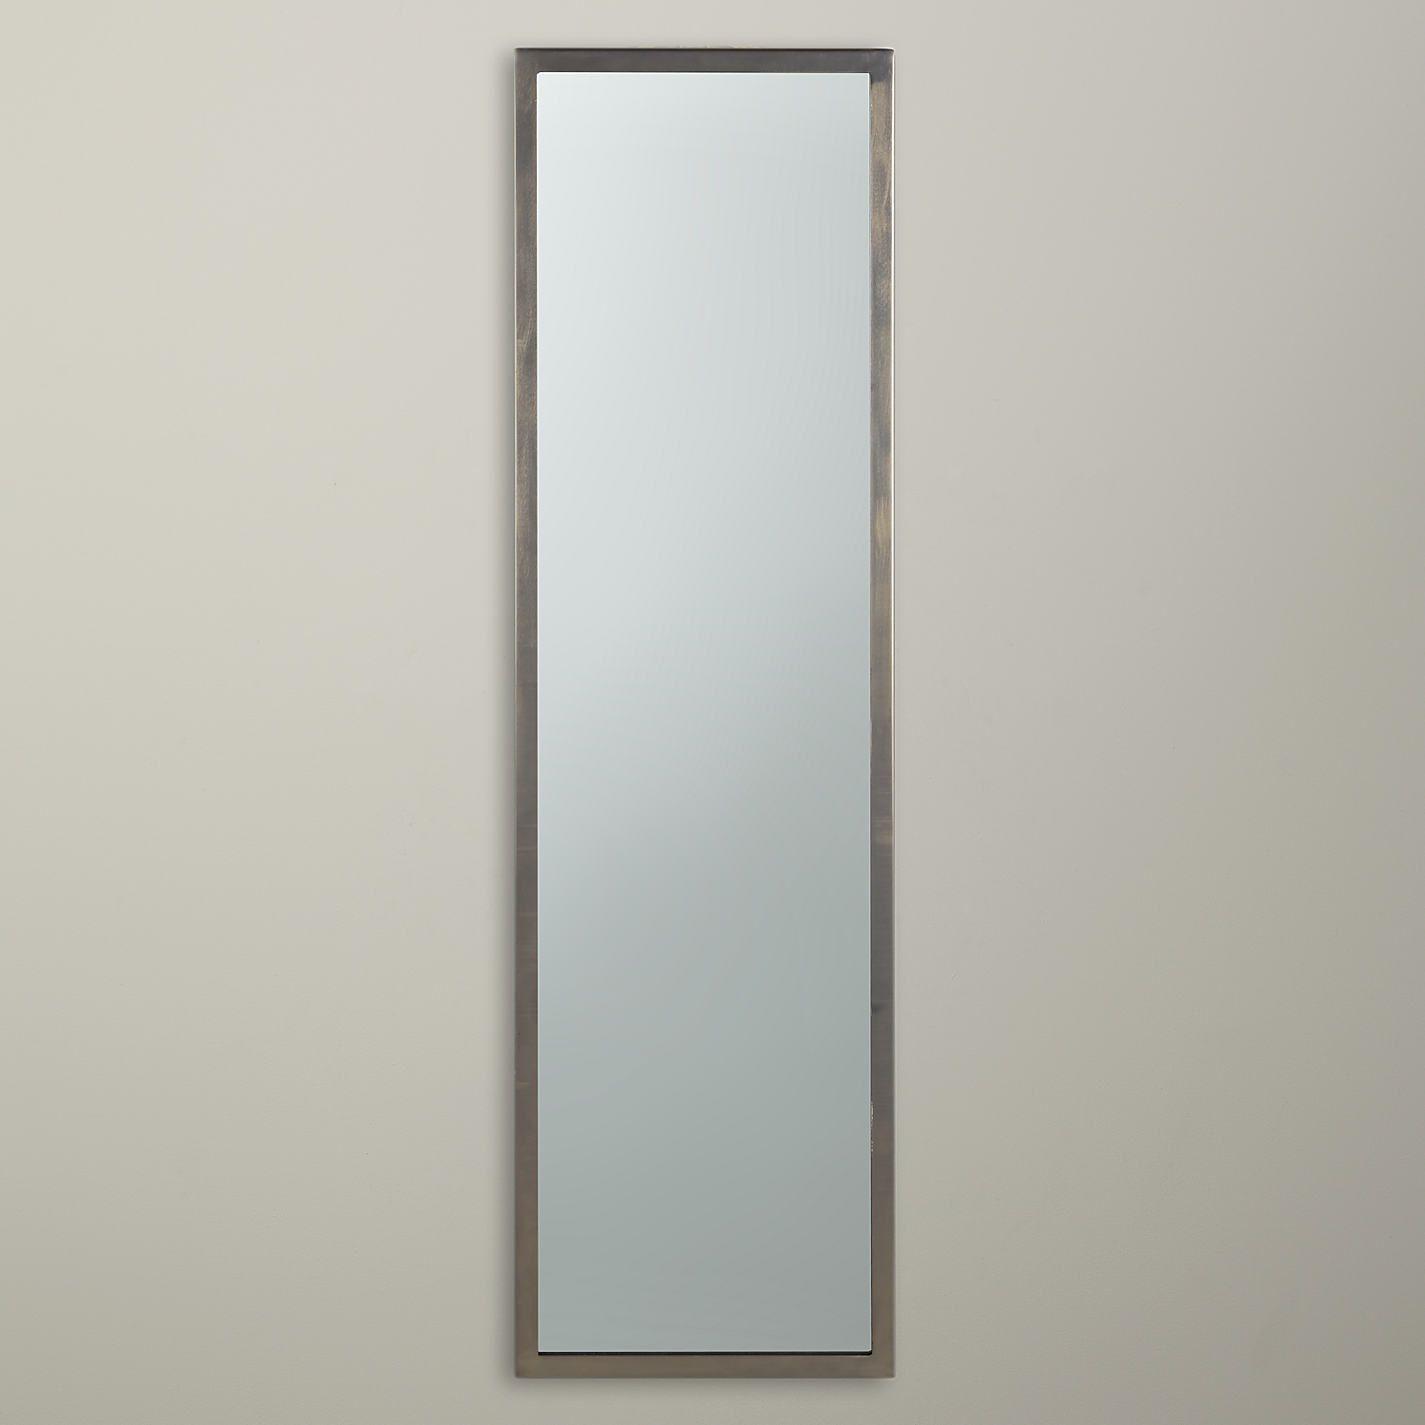 Pewter Finish Full Length Mirror, 107 x 31cm | Hall mirrors, John ...